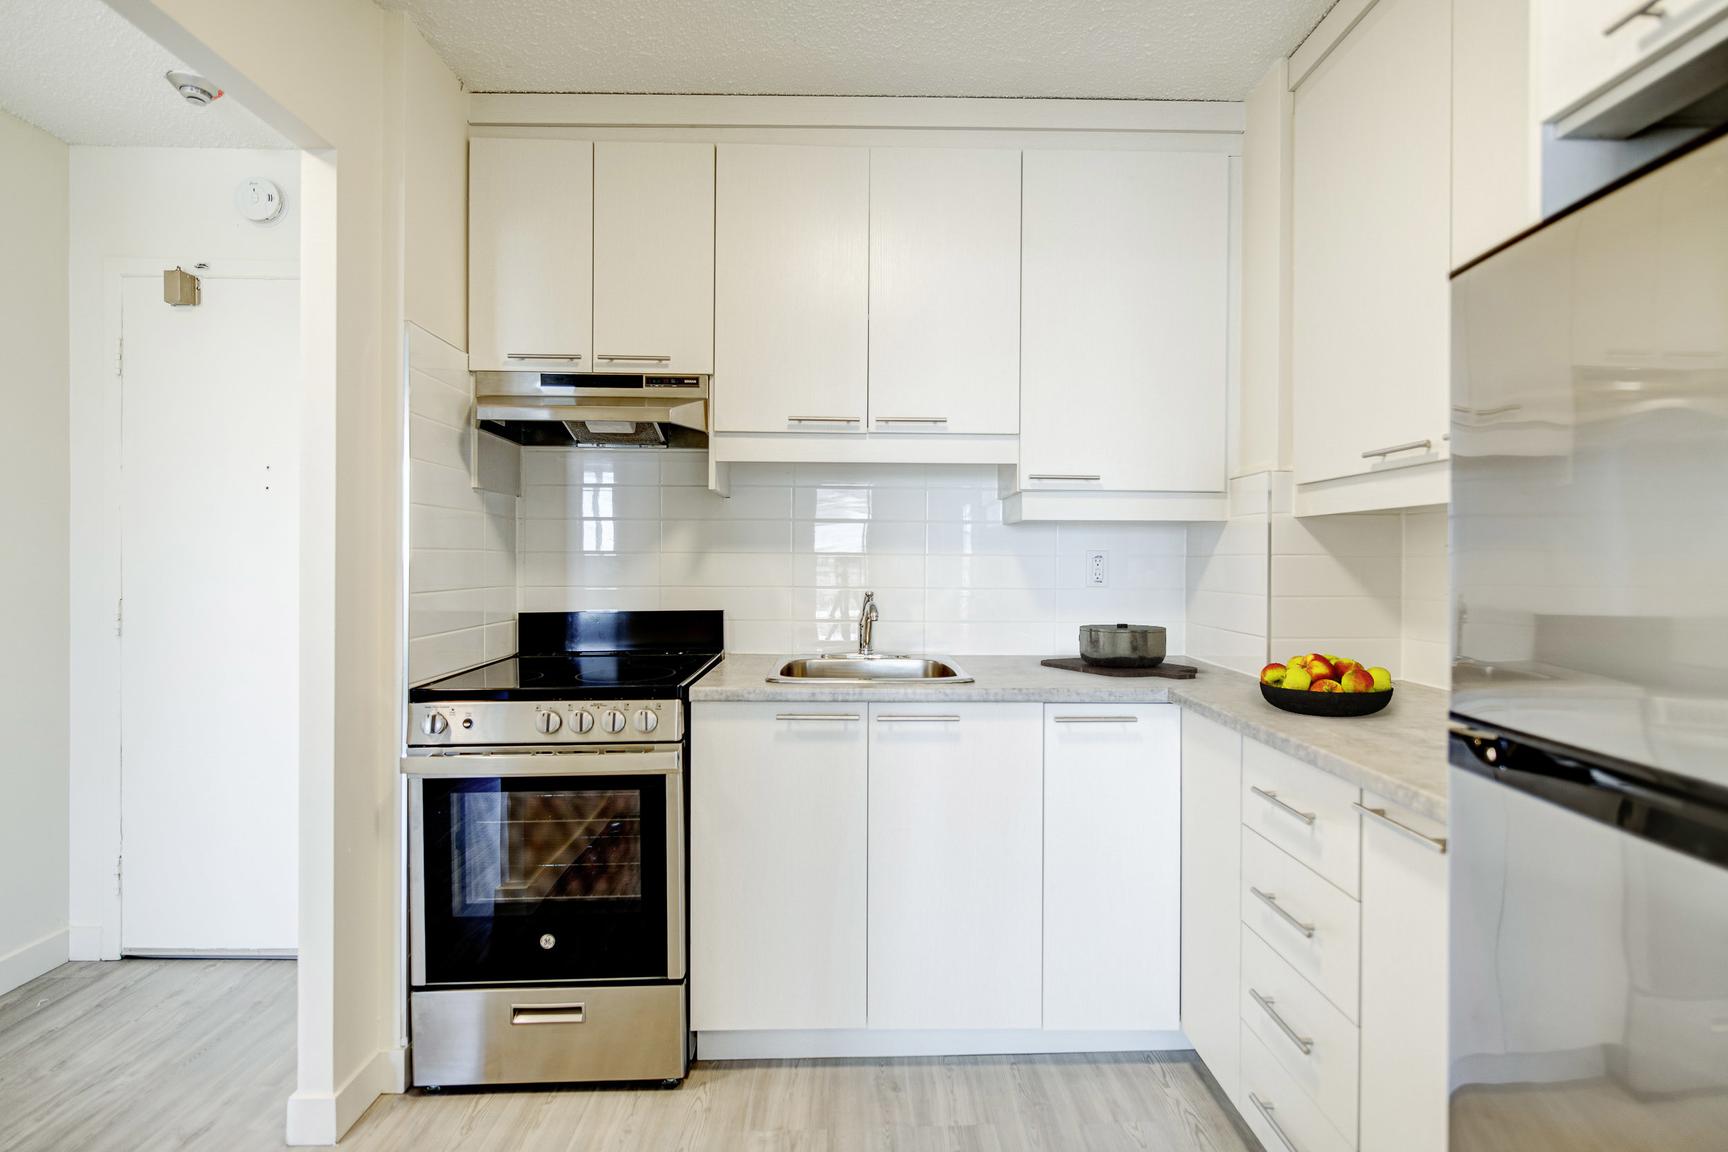 1 bedroom Apartments for rent in Laval at Le Quatre Cent - Photo 03 - RentersPages – L407183